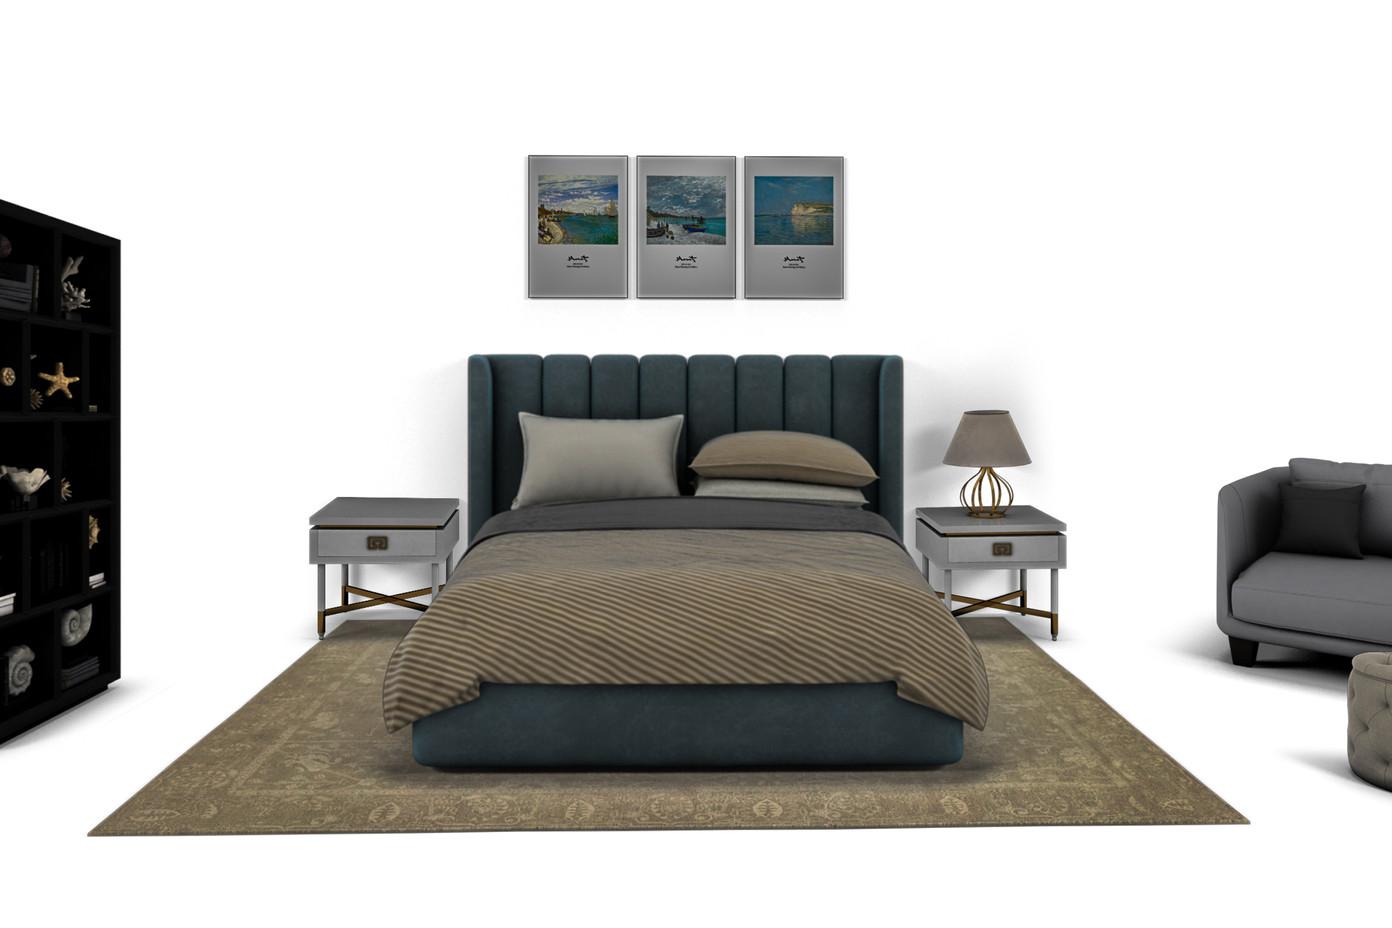 Bedroom Coastal 9.jpg